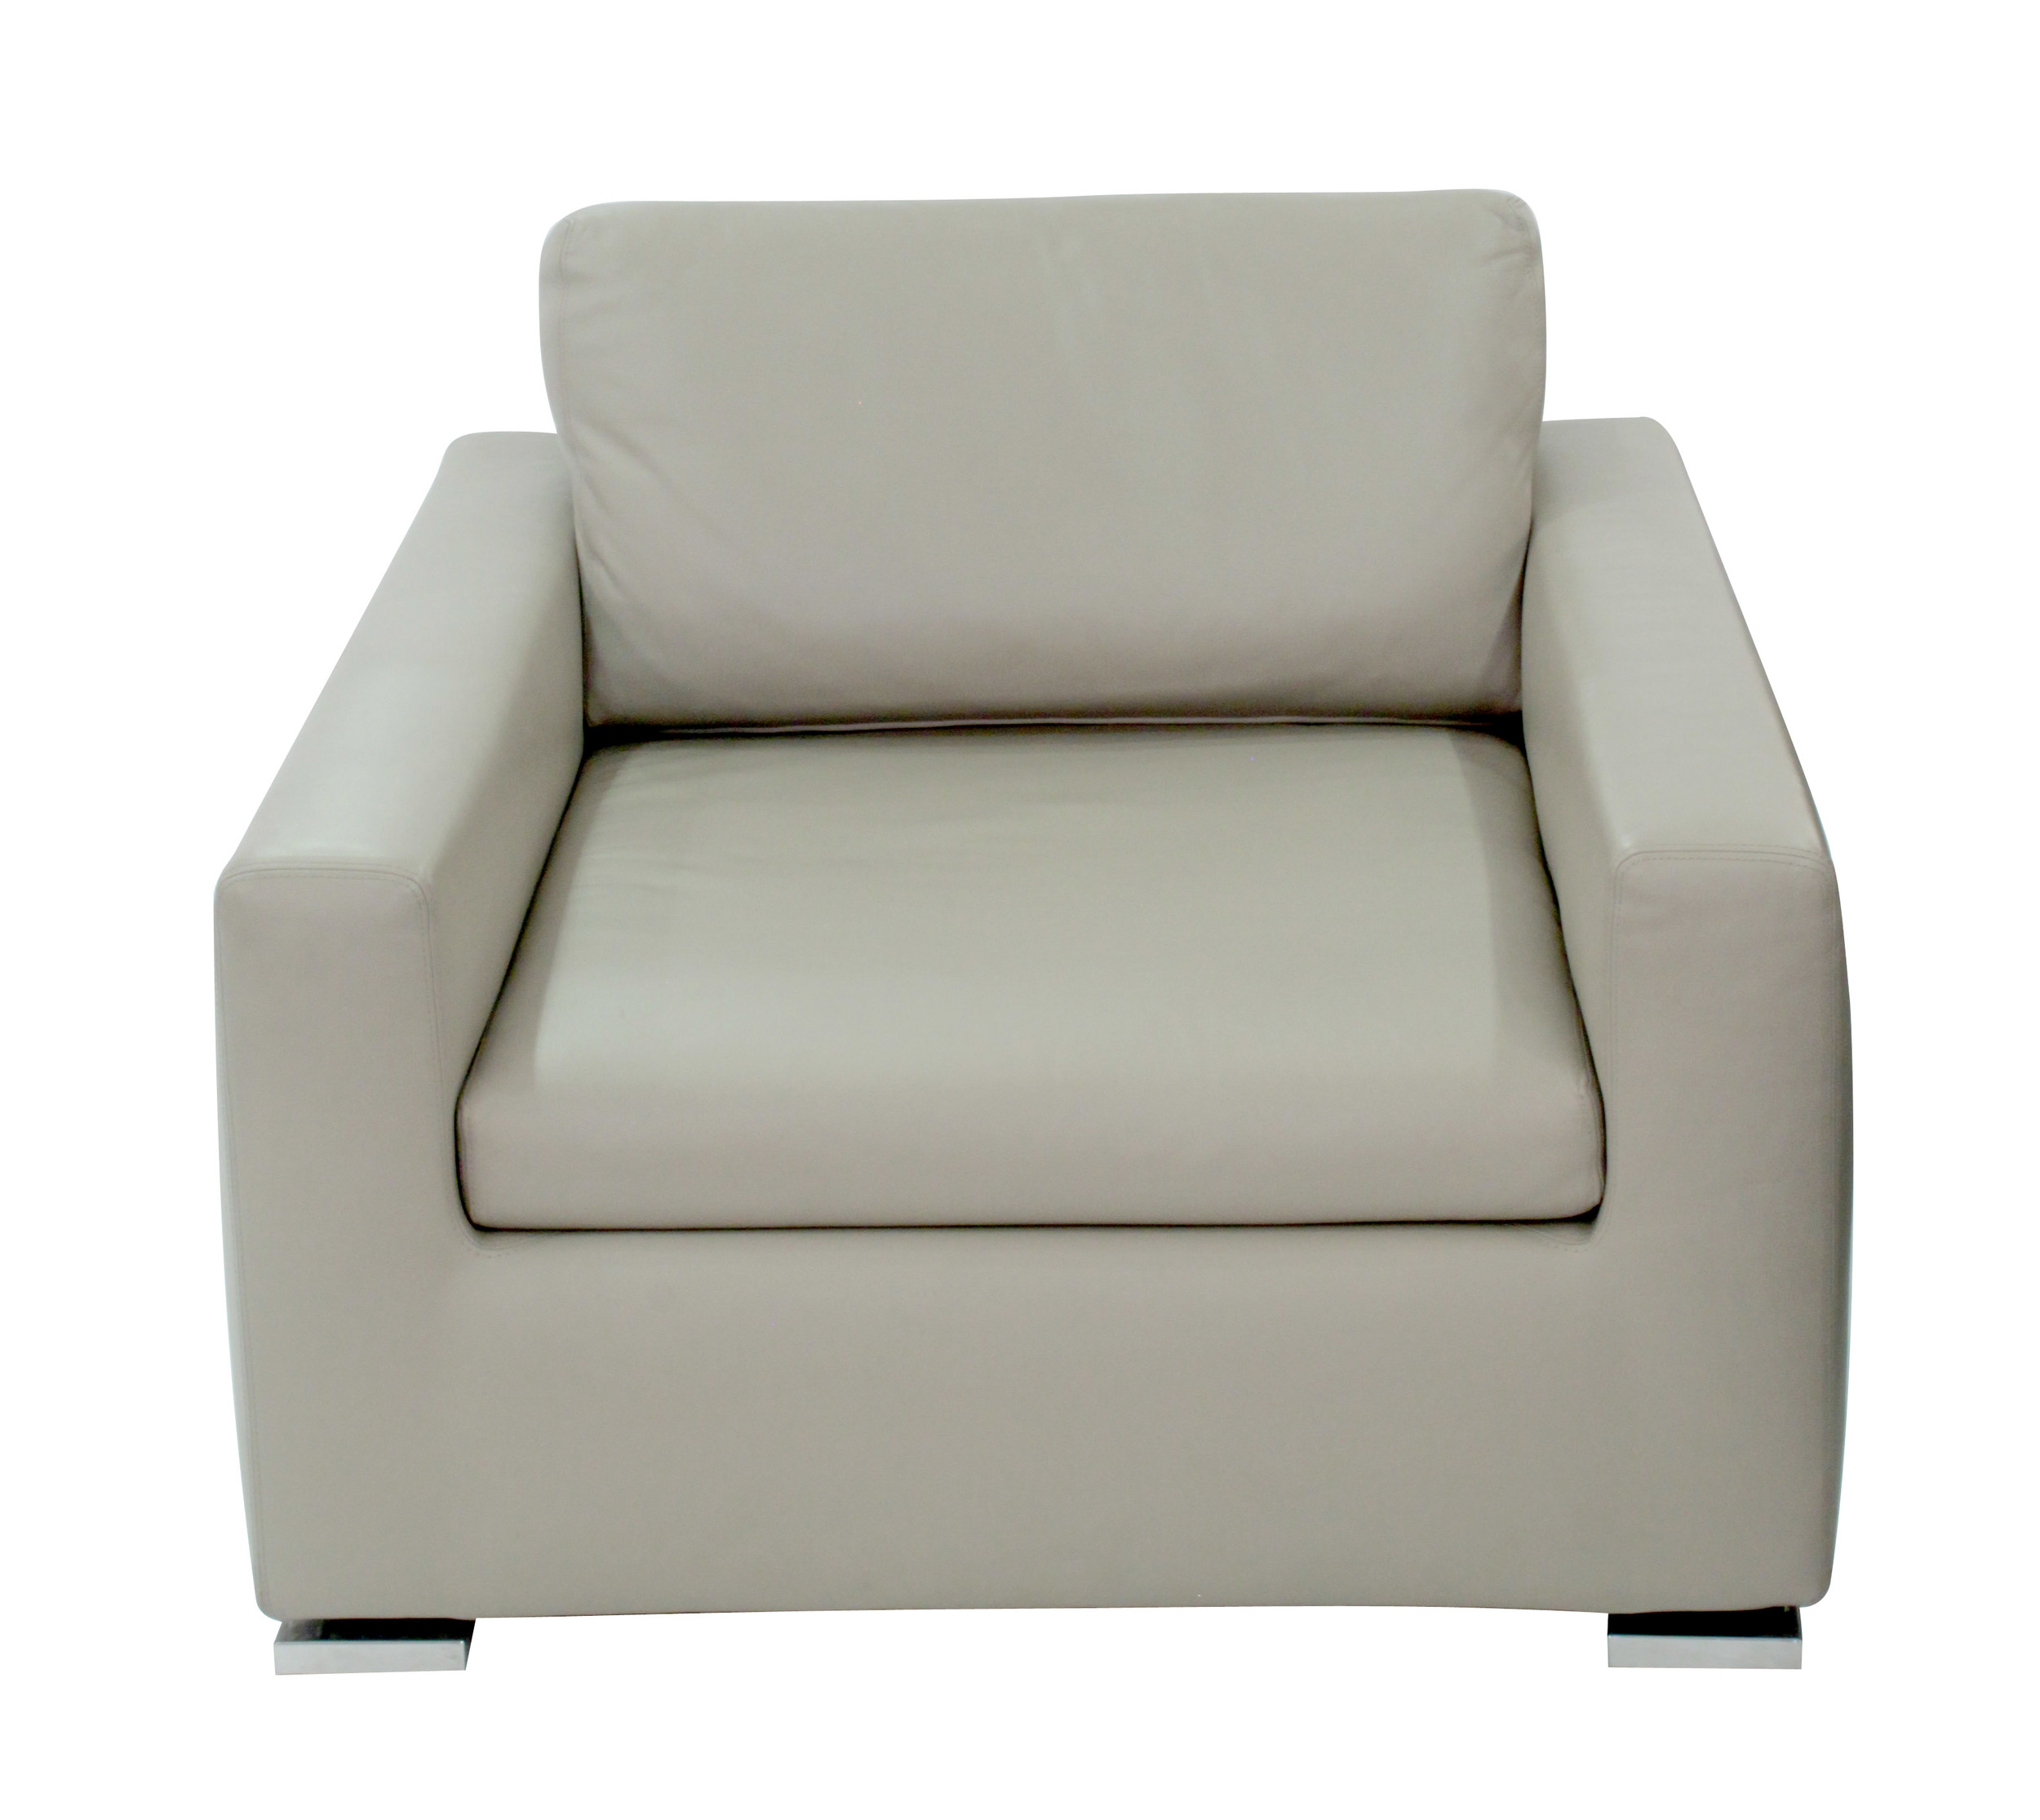 Minotti 65 cleanline lthr clubchairs54 detail2 hires.JPG